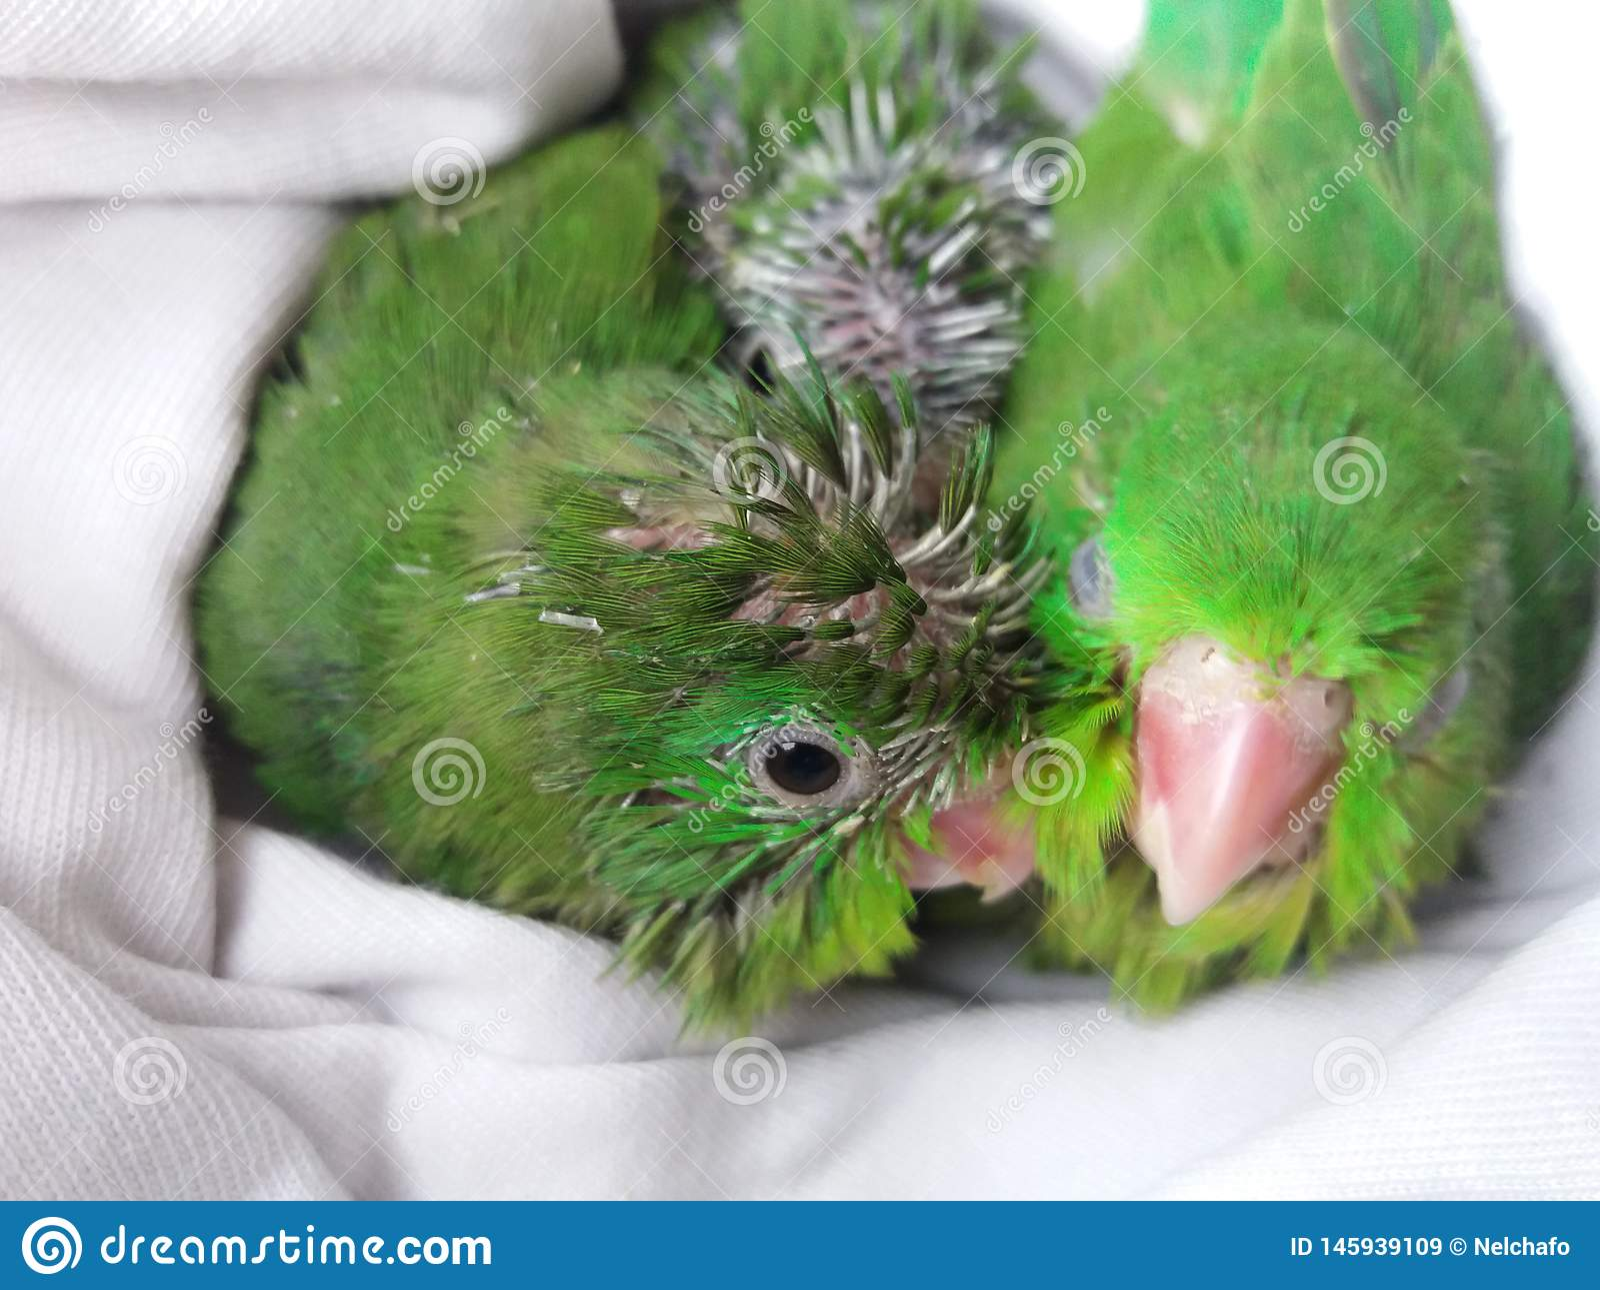 Green parrot chicks